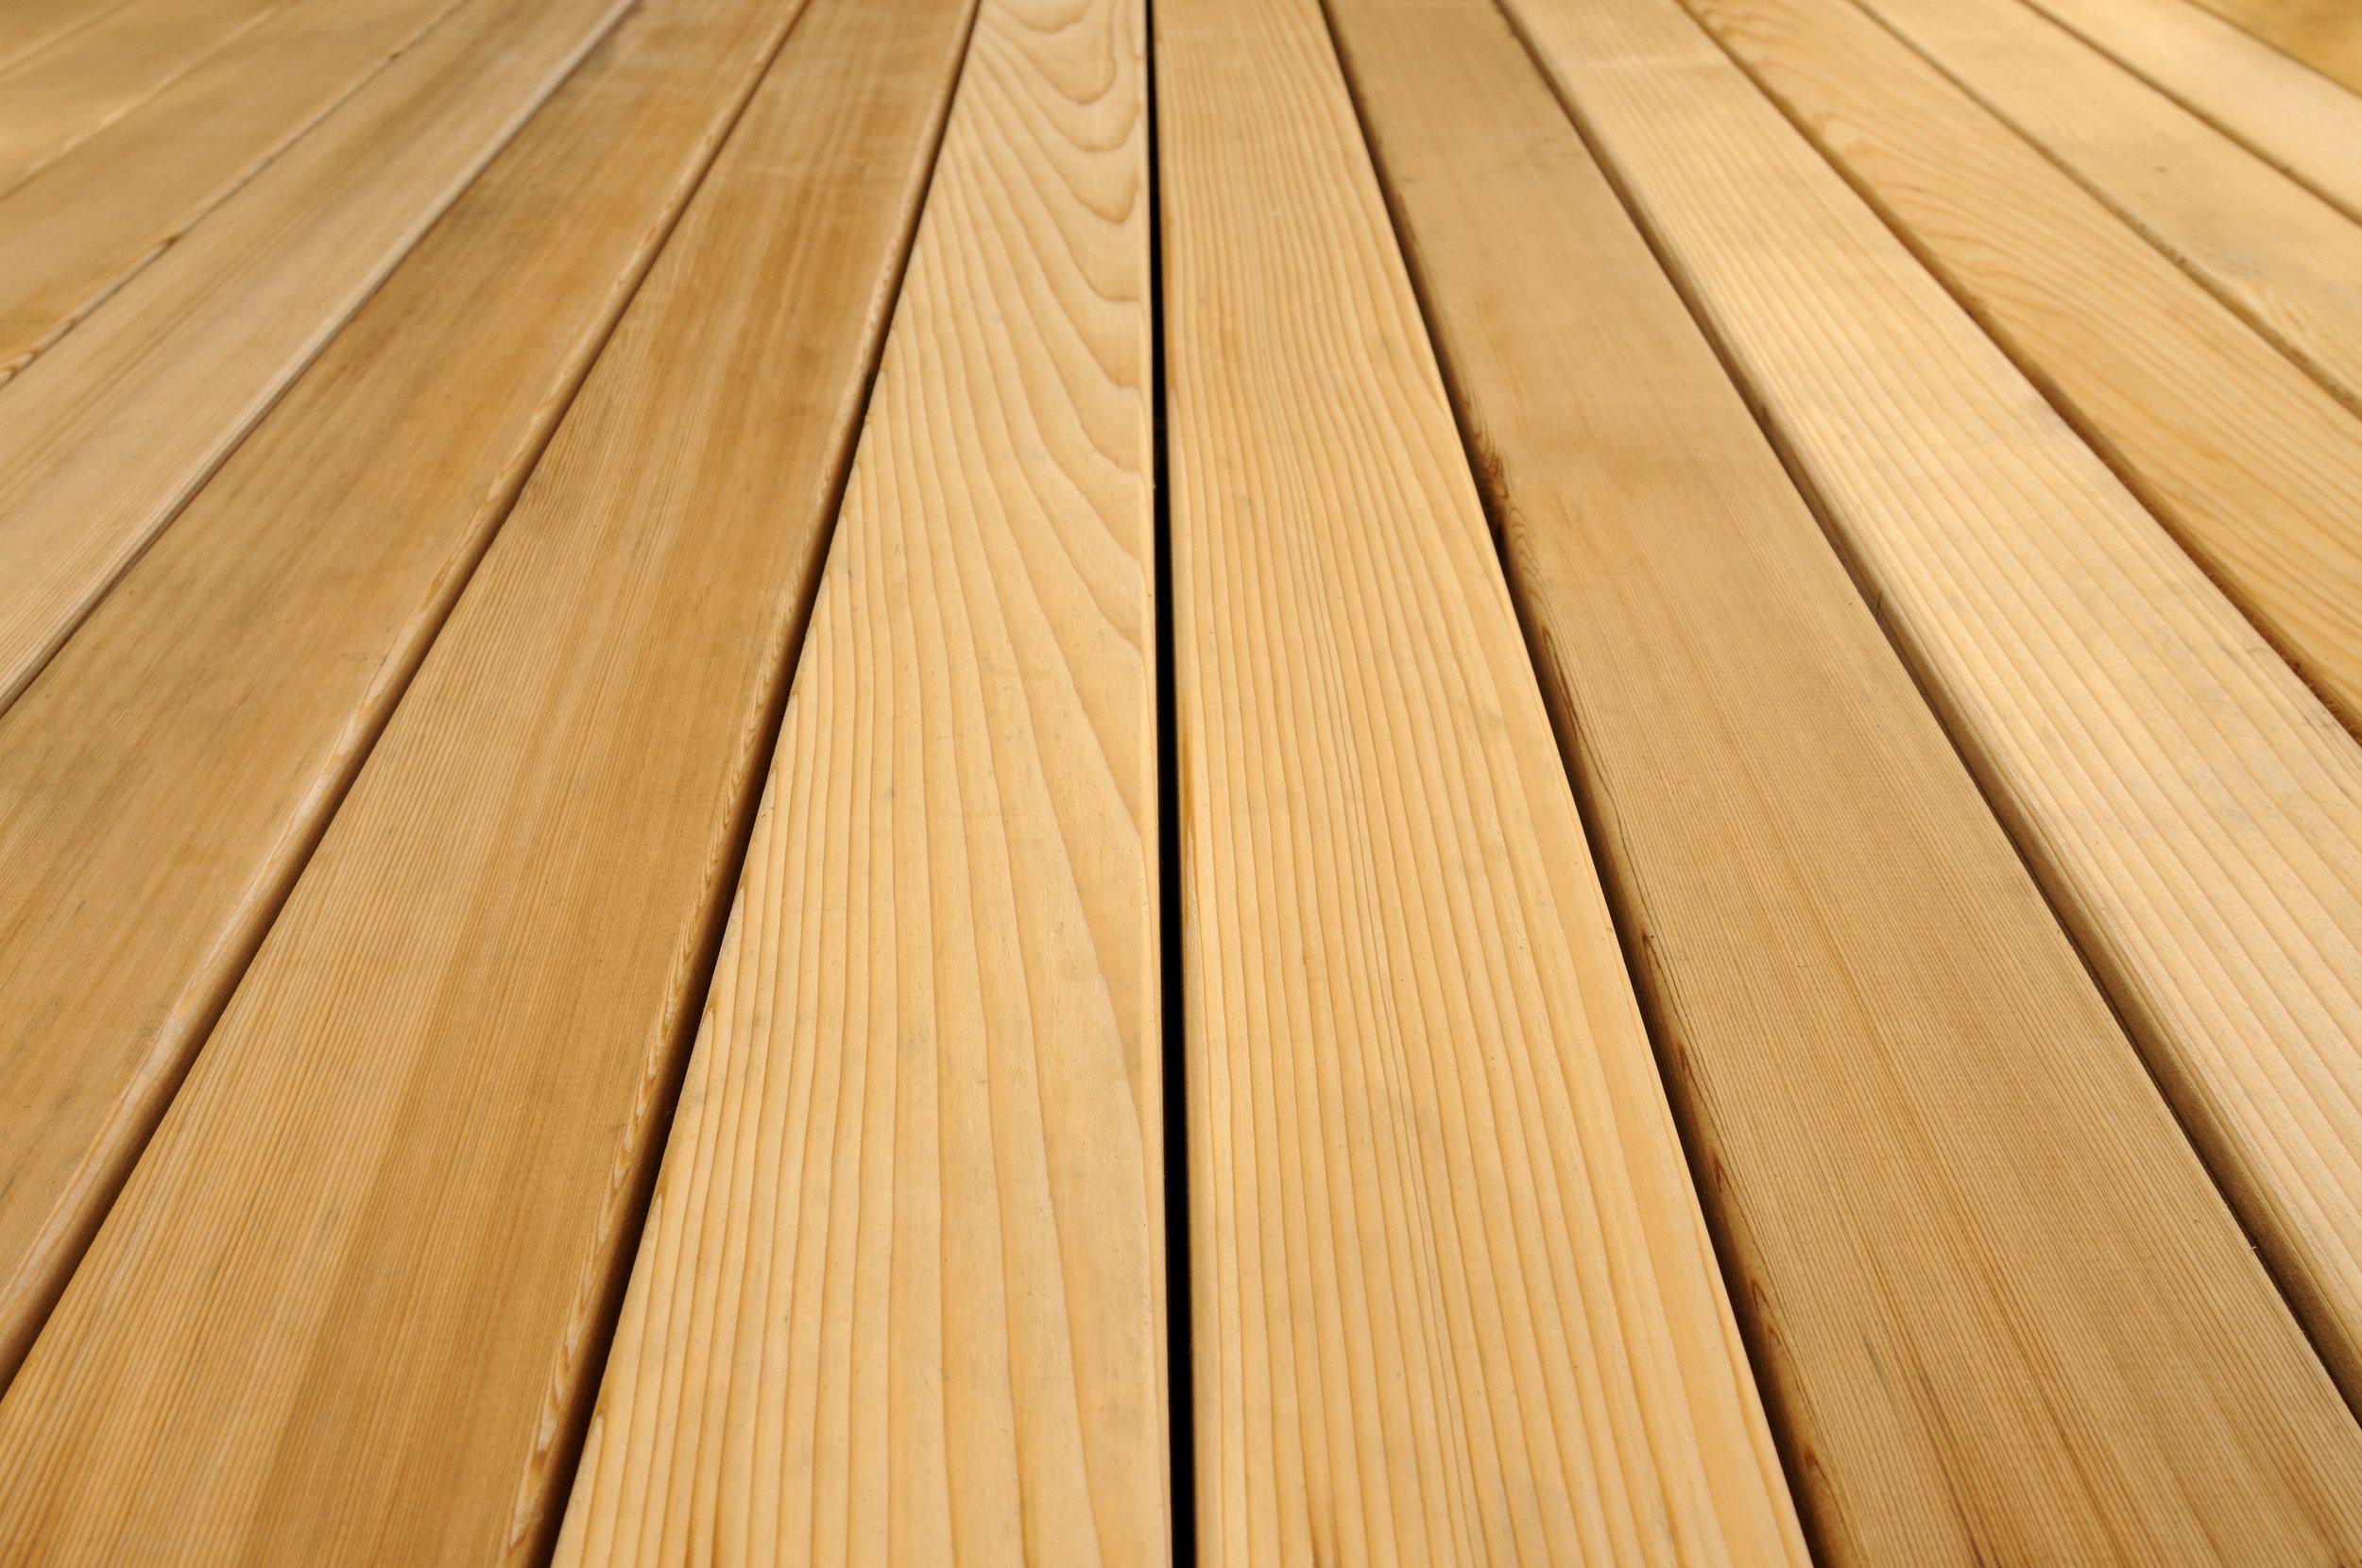 Couintry-Lumber-Cedar.jpg